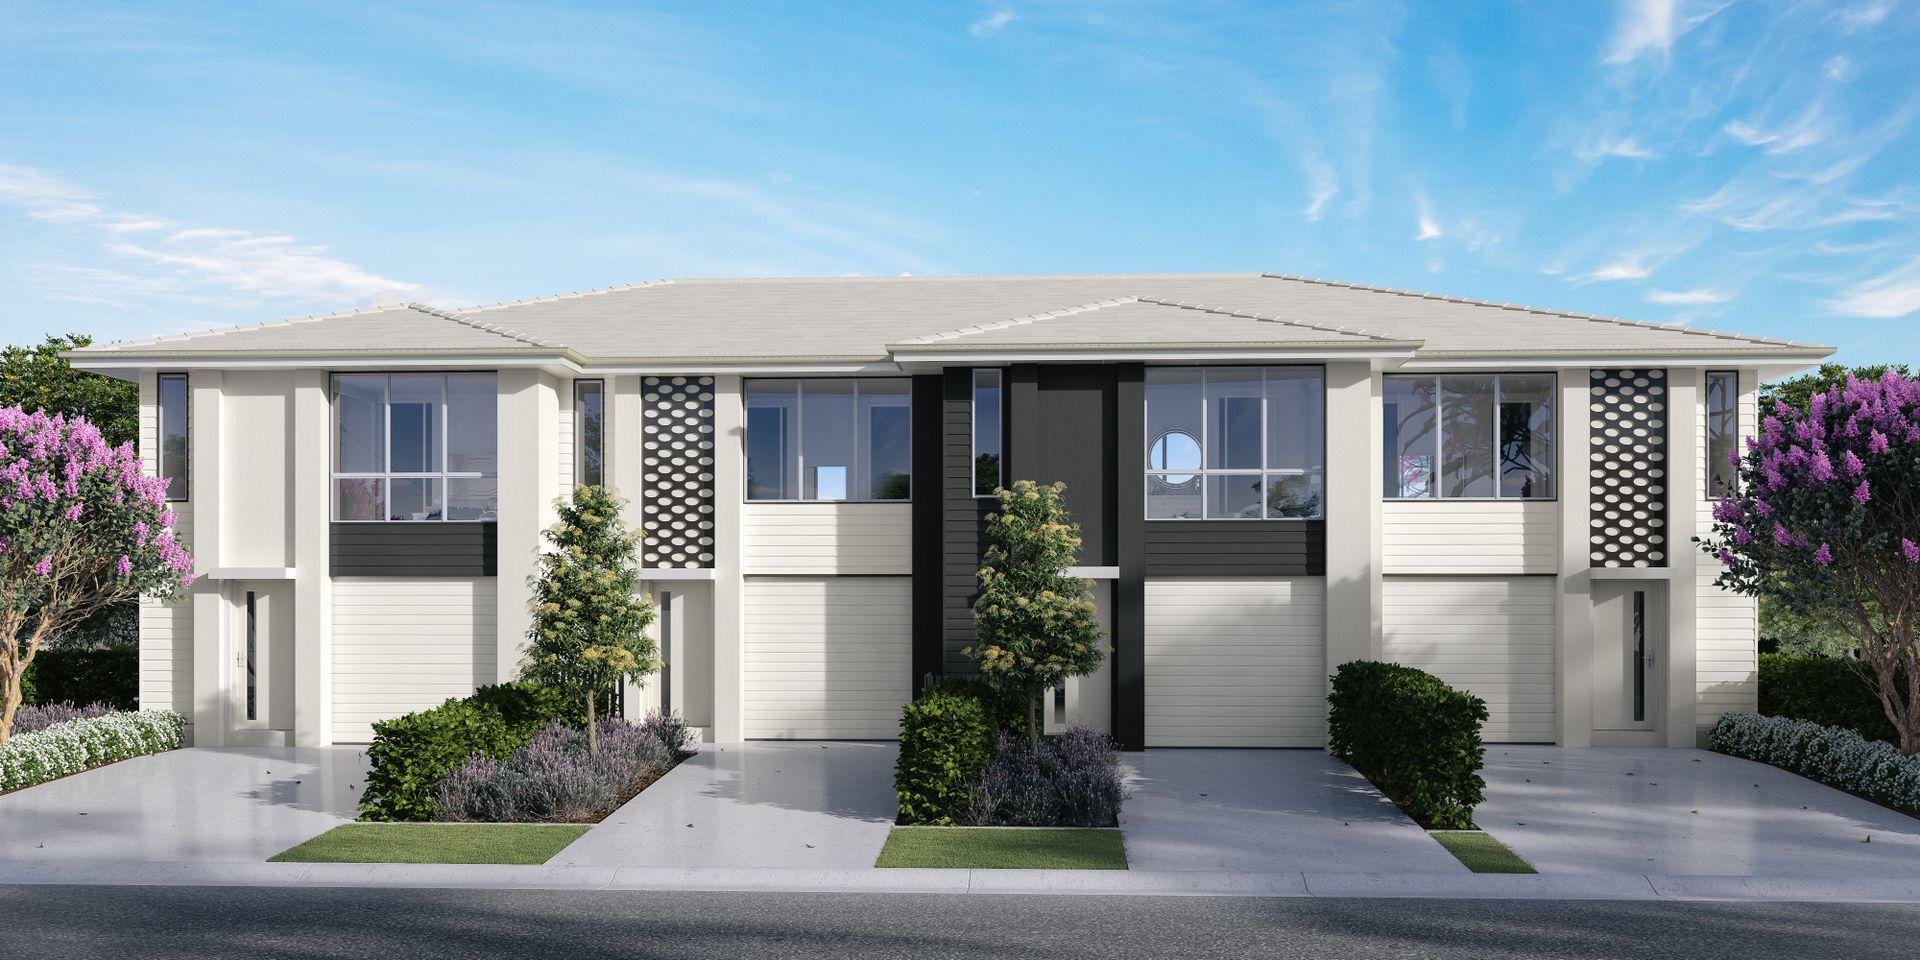 69/36 Cox Road, Pimpama QLD 4209, Image 0